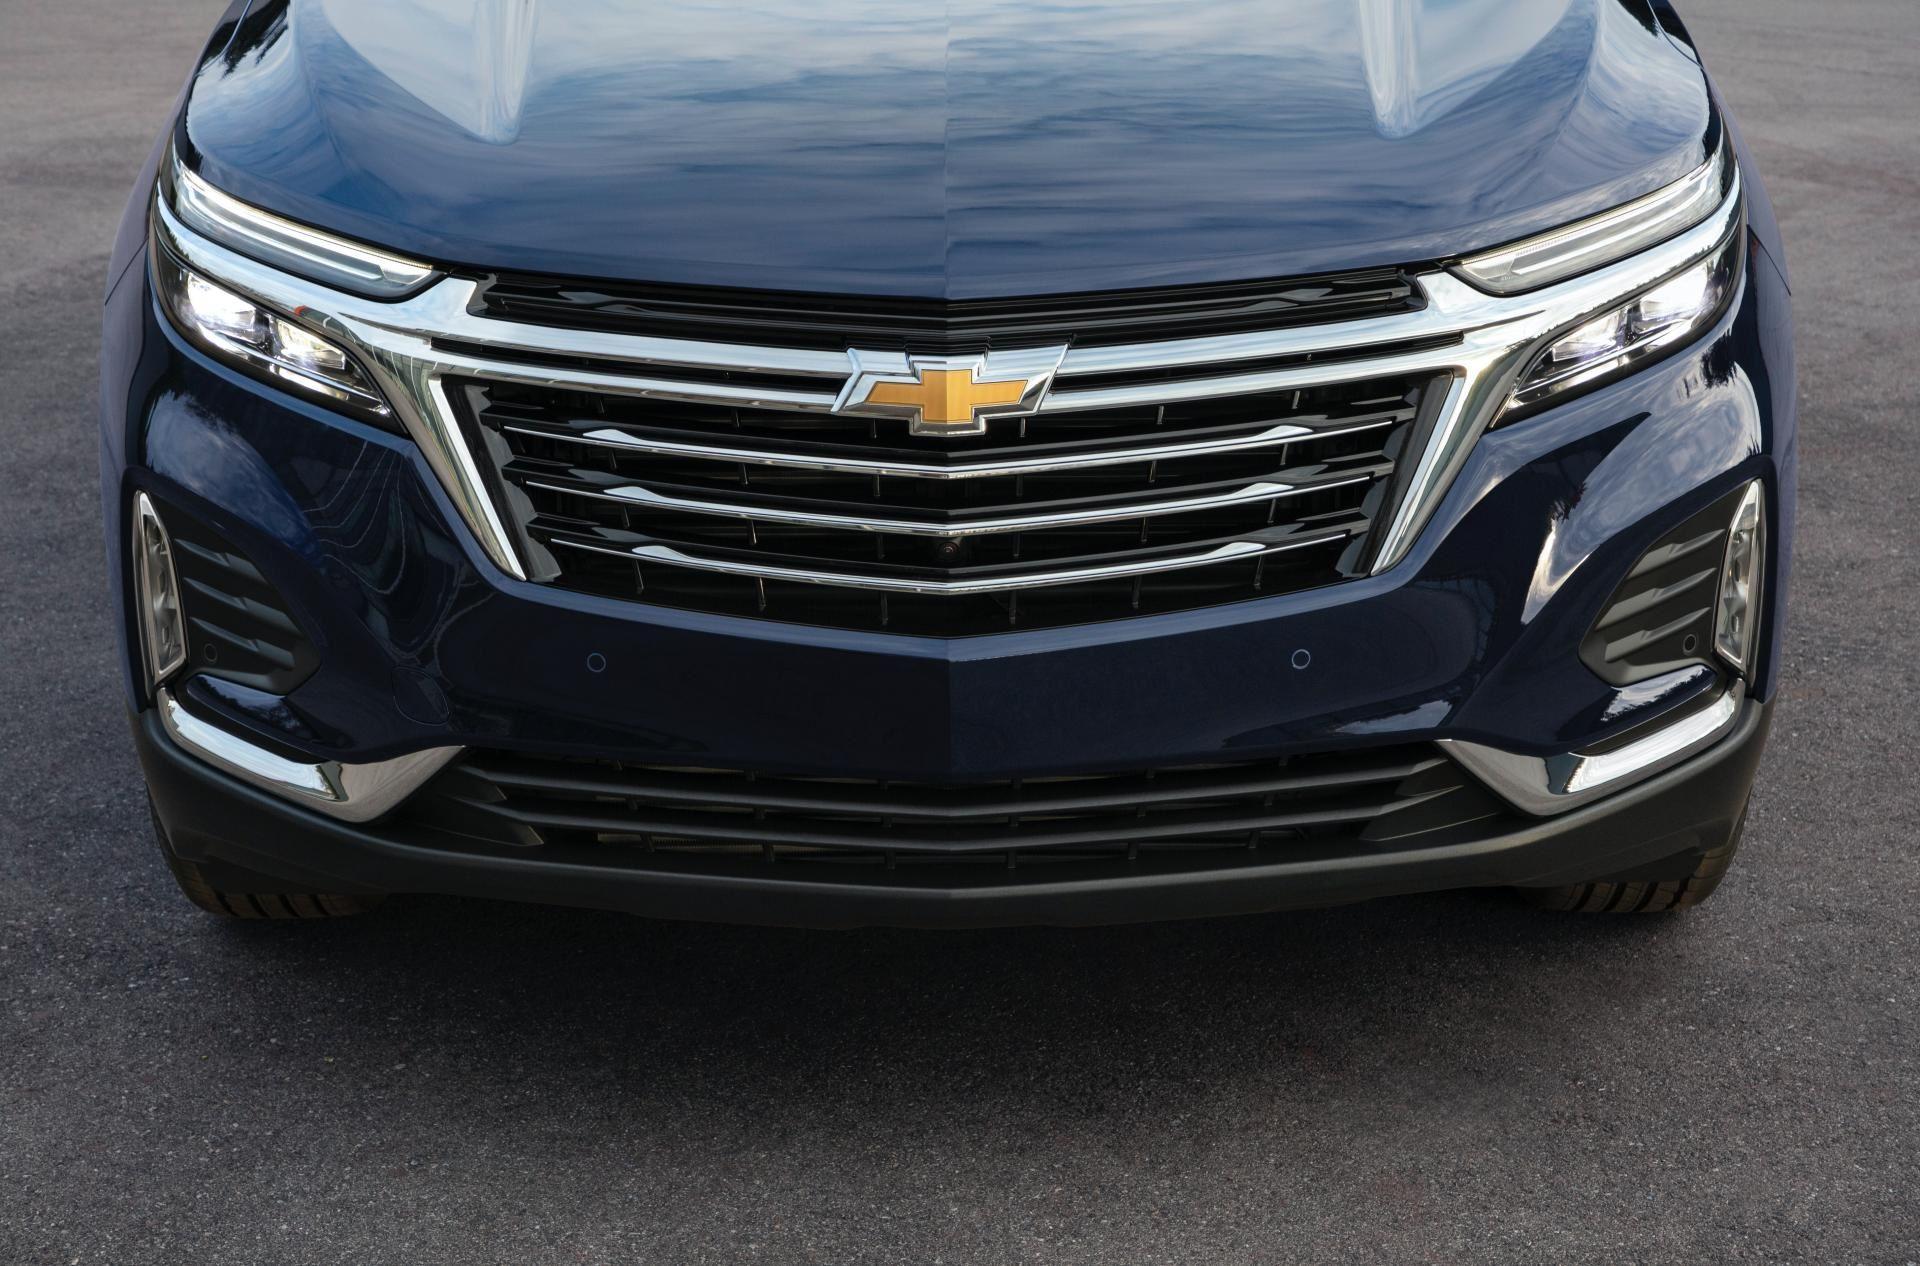 Chevrolet-Equinox-facelift-2020-18